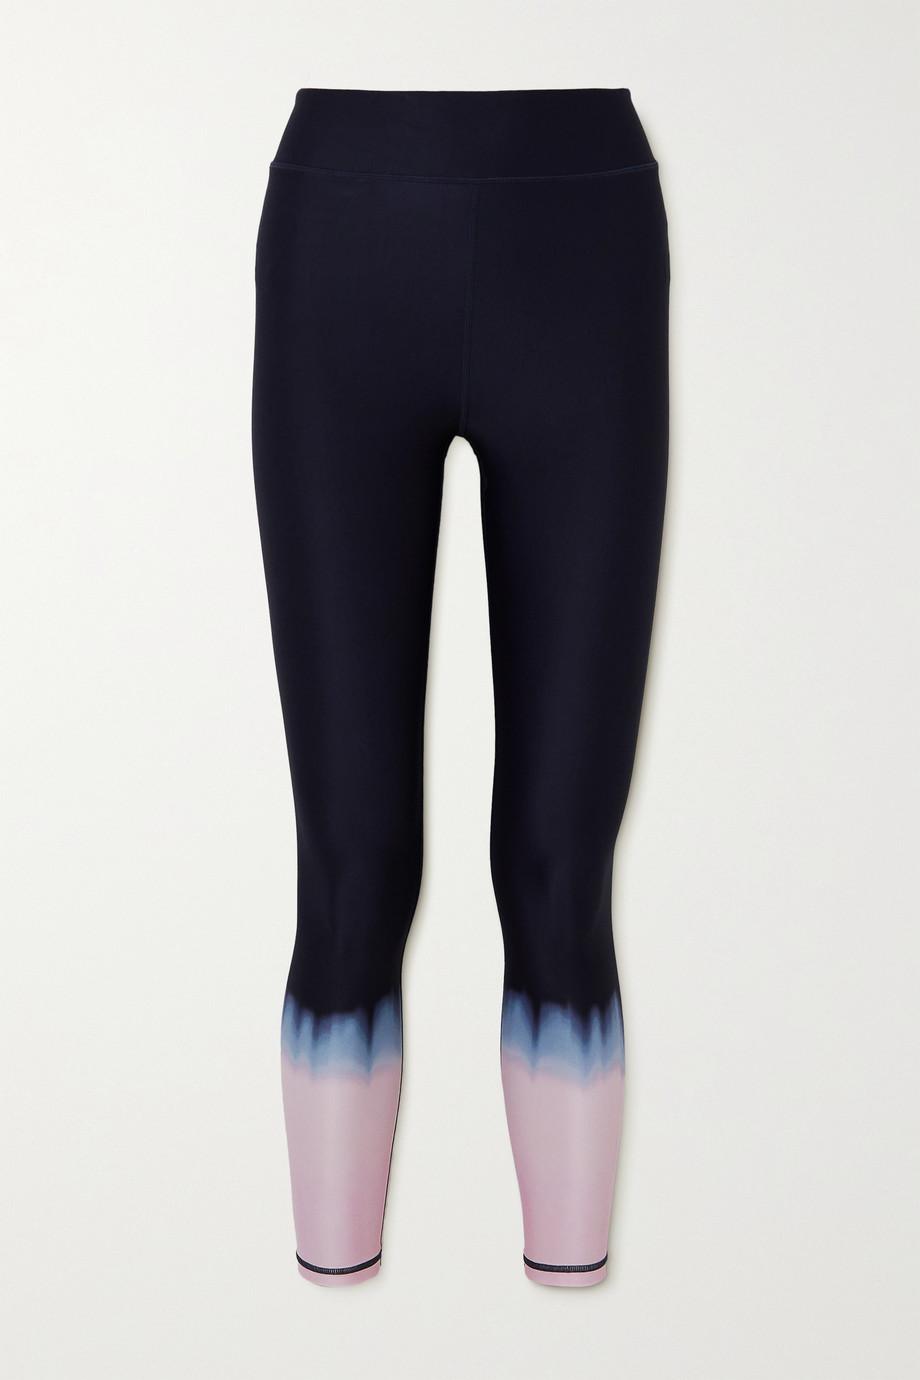 The Upside Legging stretch tie & dye Seawater